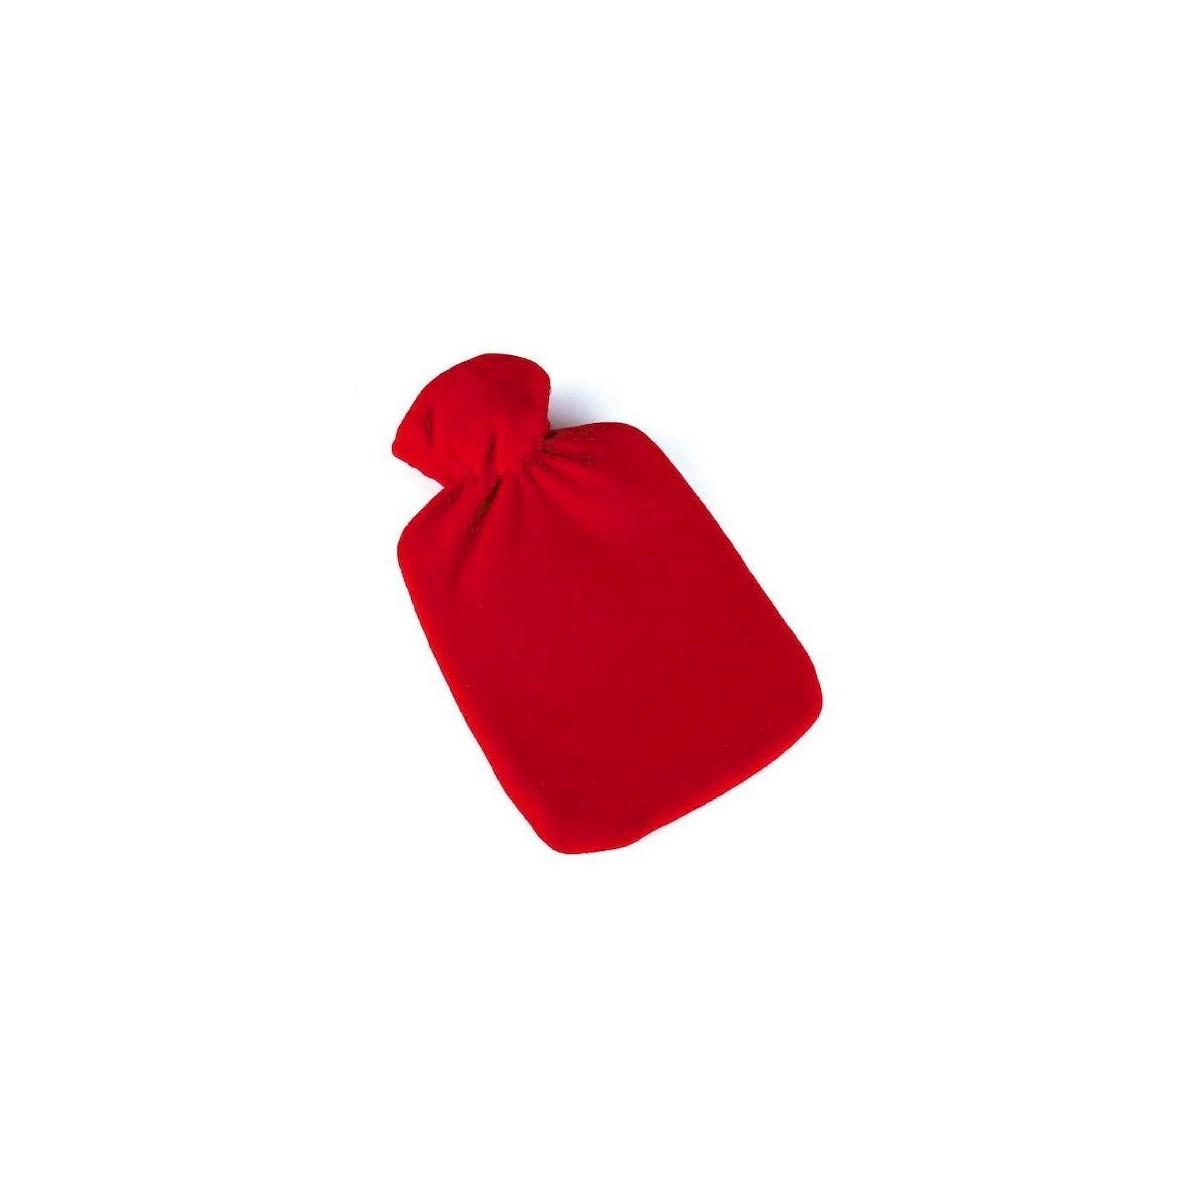 Bolsa de agua caliente Jata BAC42RJ, roja,